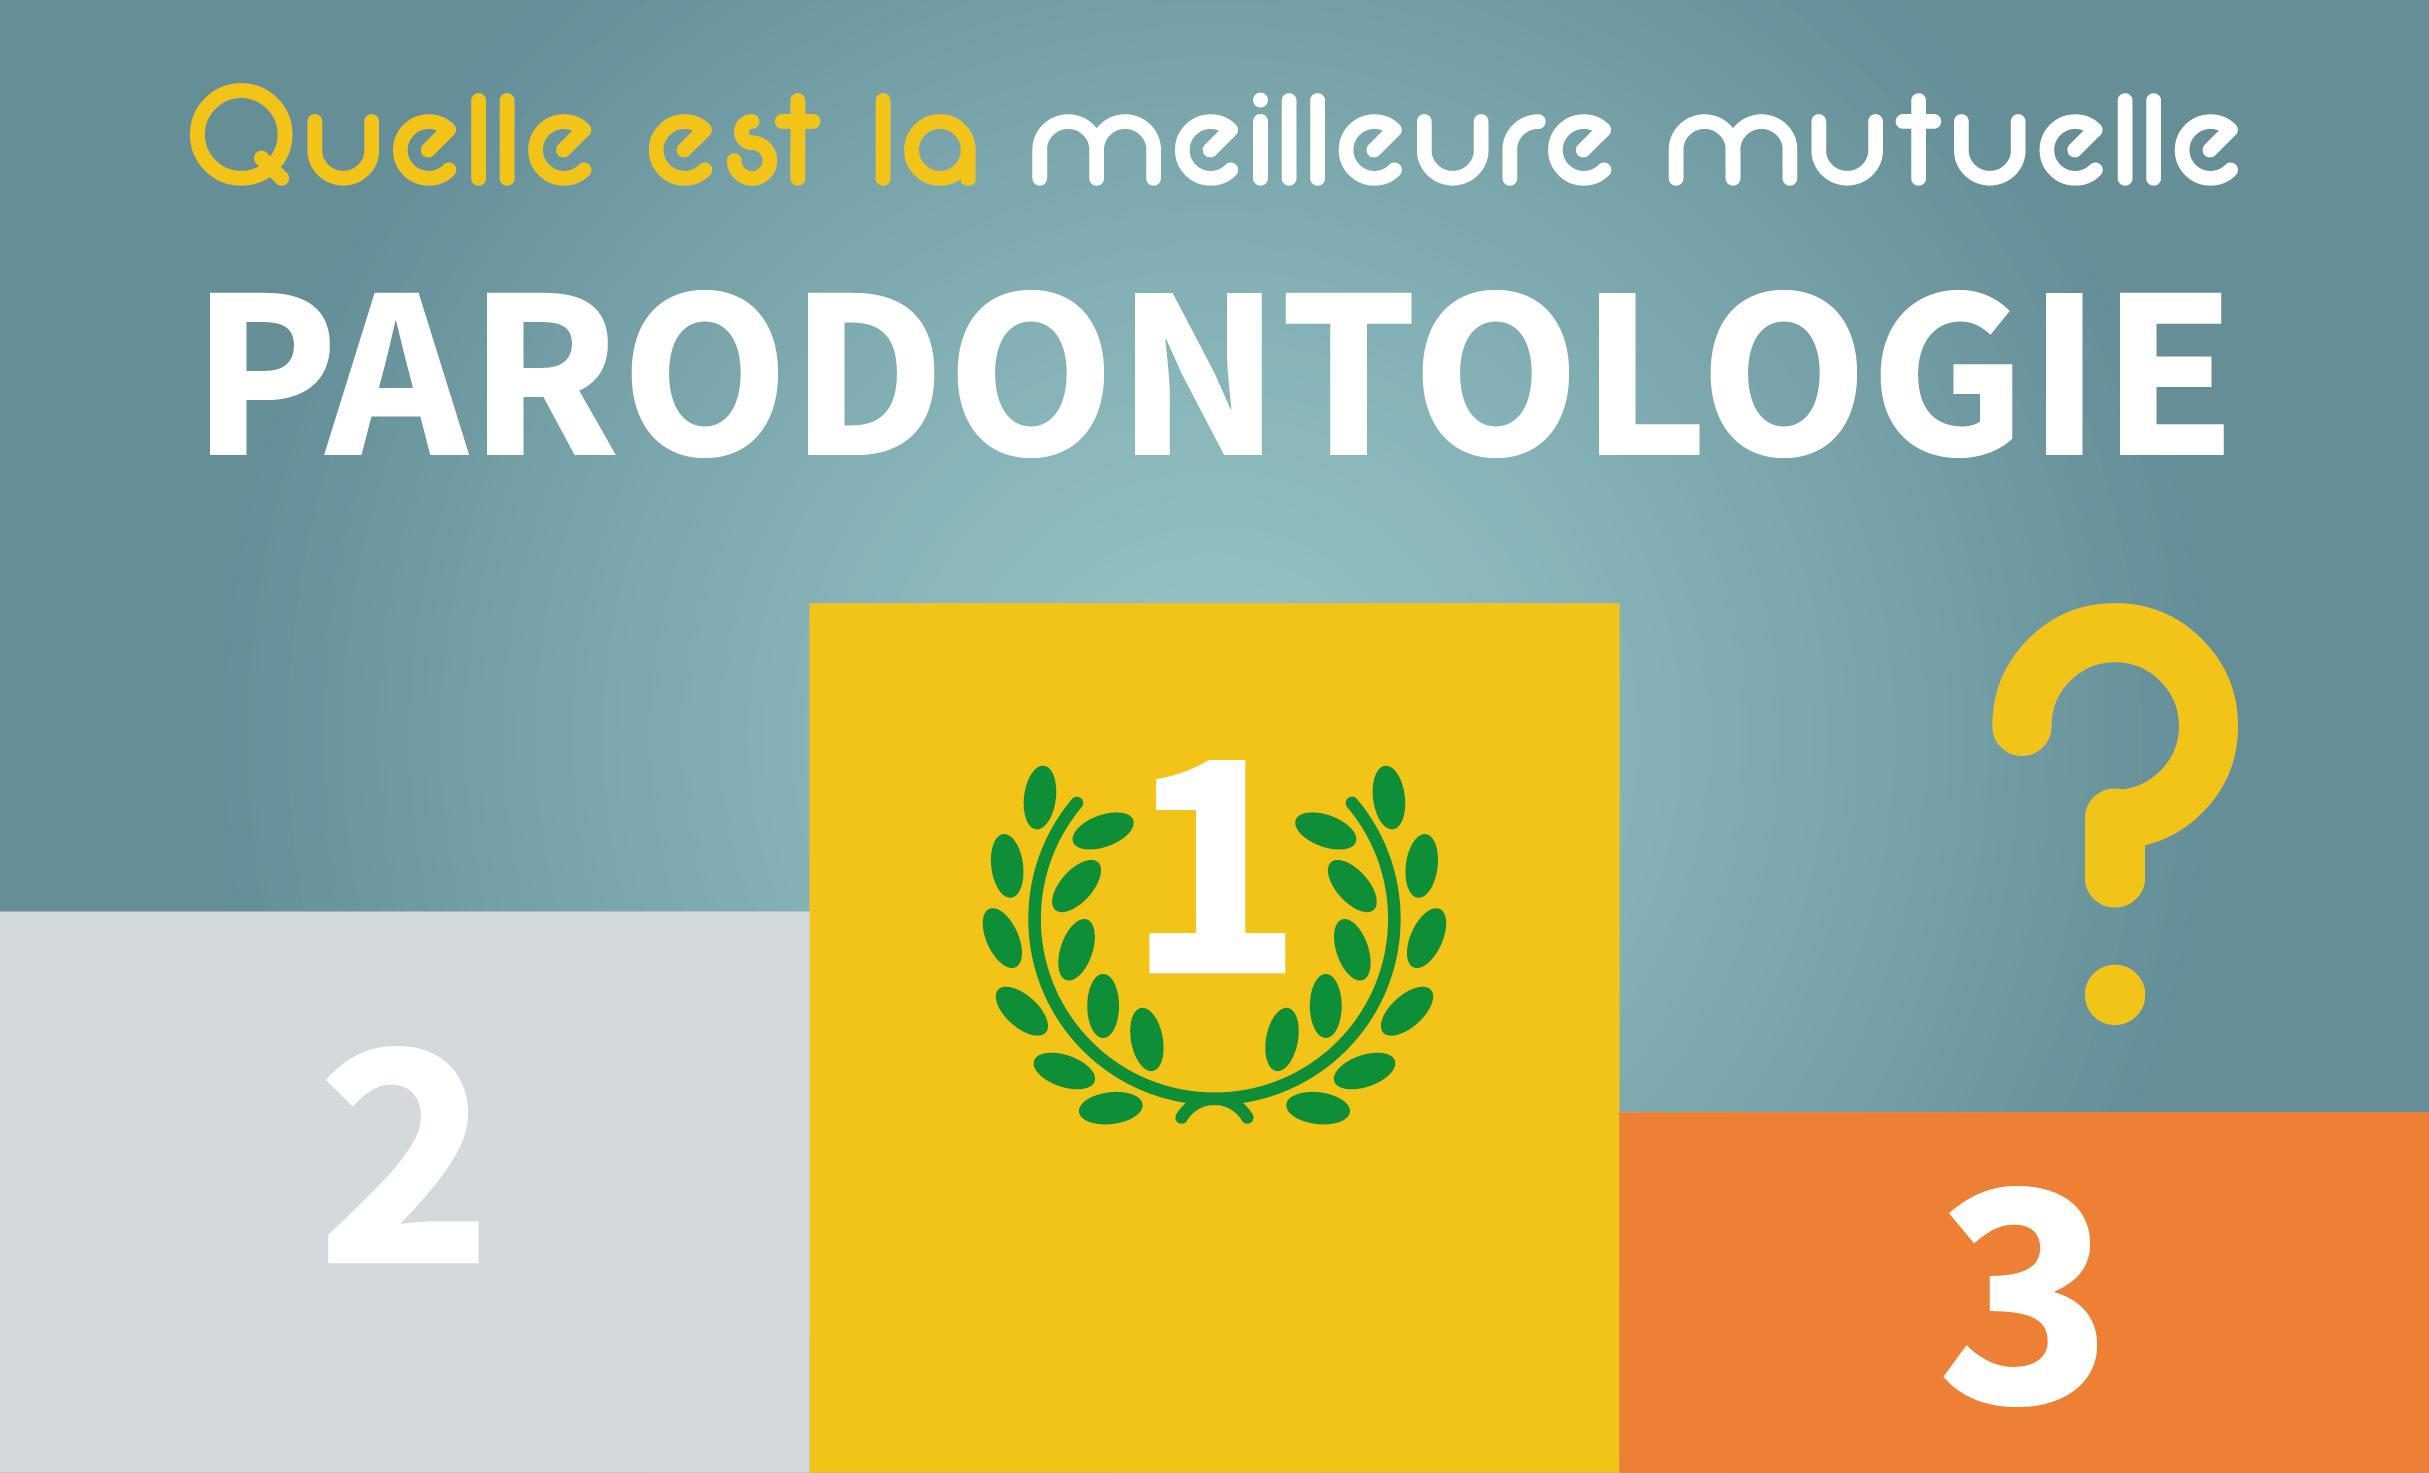 podium parodontologie